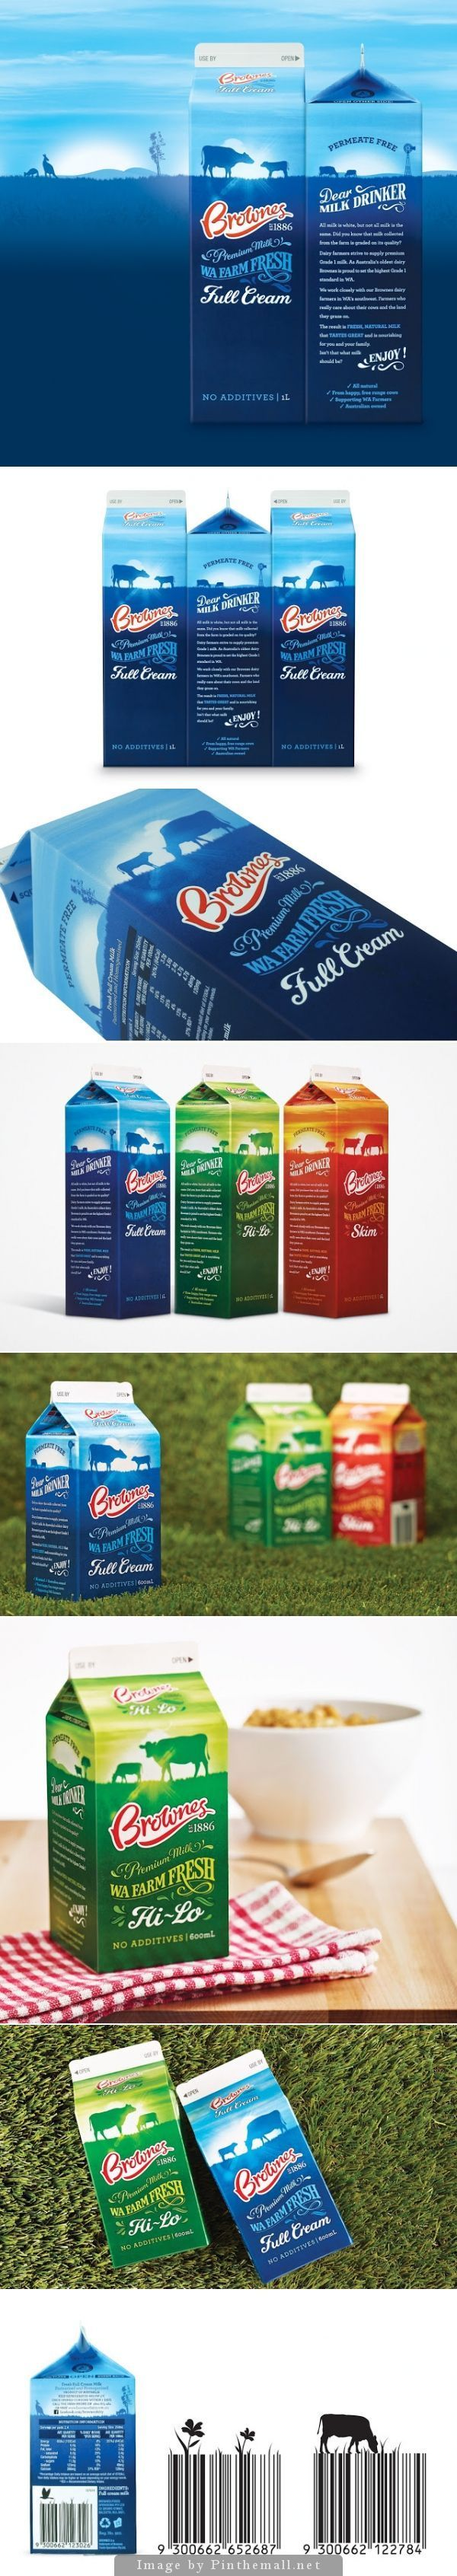 Brownes White #Milk ...